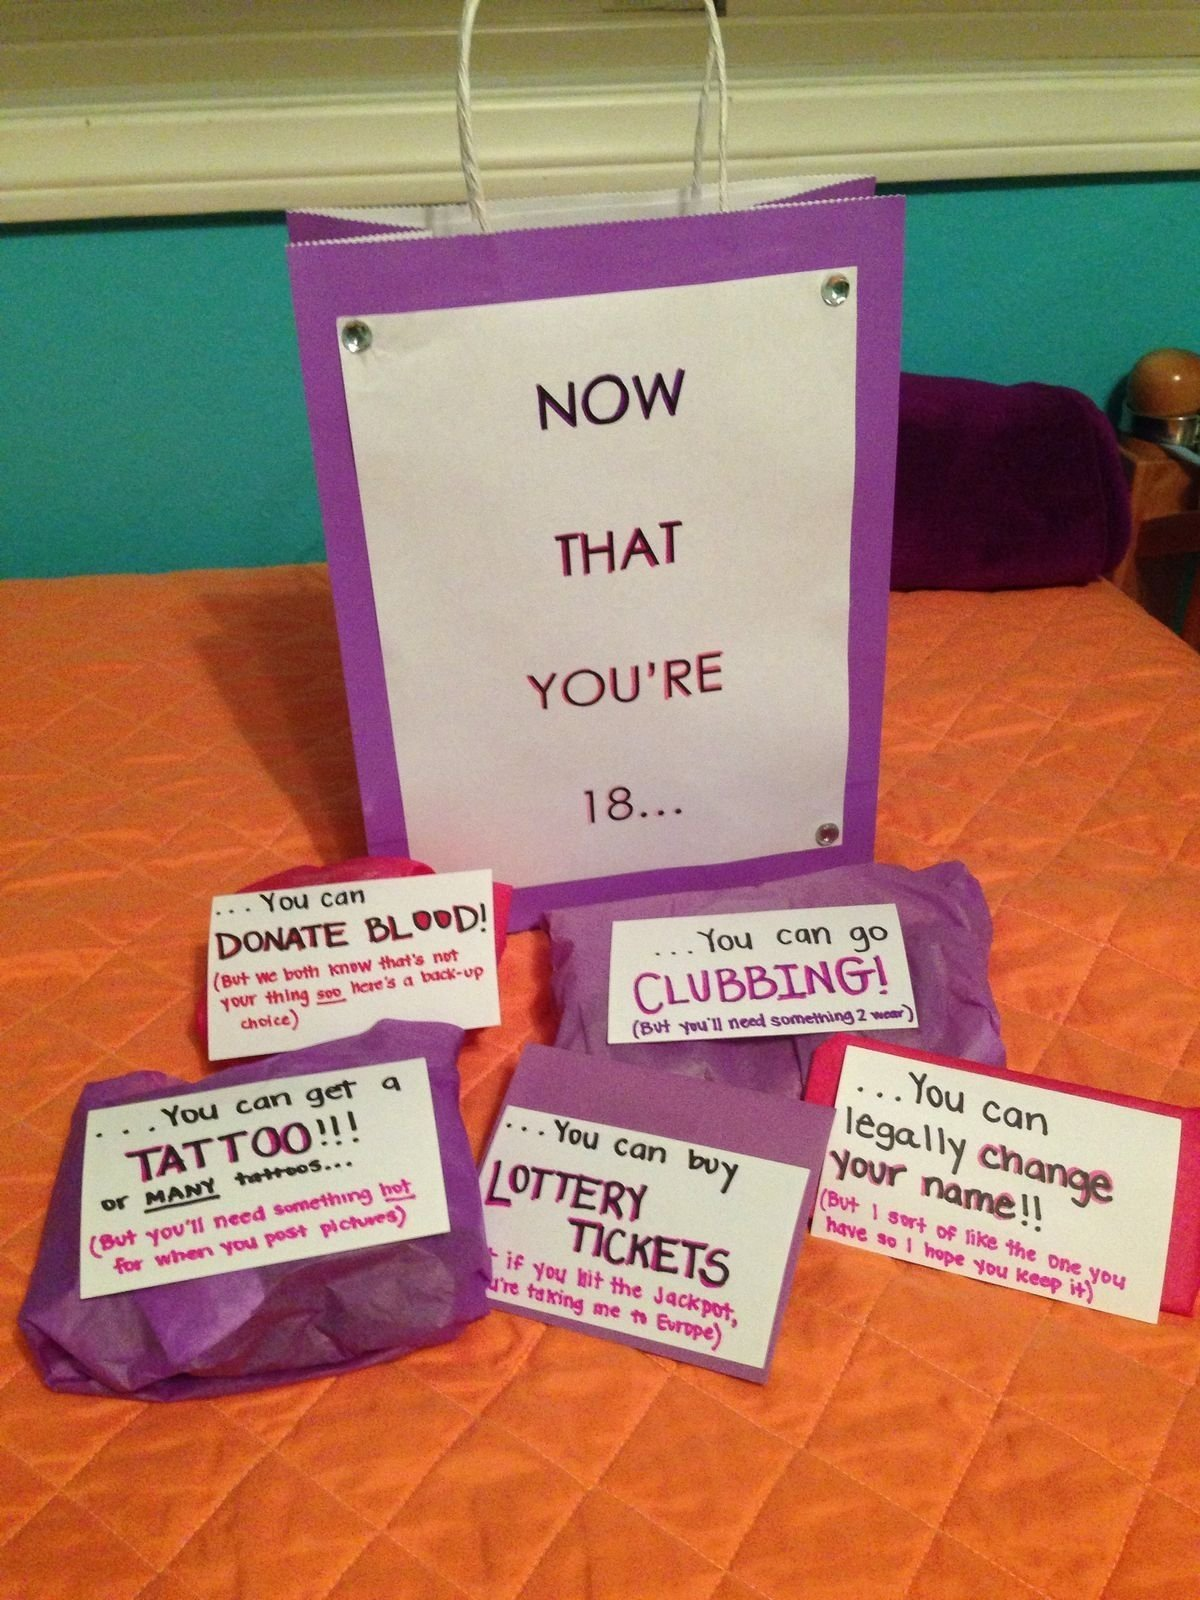 10 Amazing Birthday Ideas For Your Girlfriend Pinavani Shukla On Gifts Birthdays Gift And